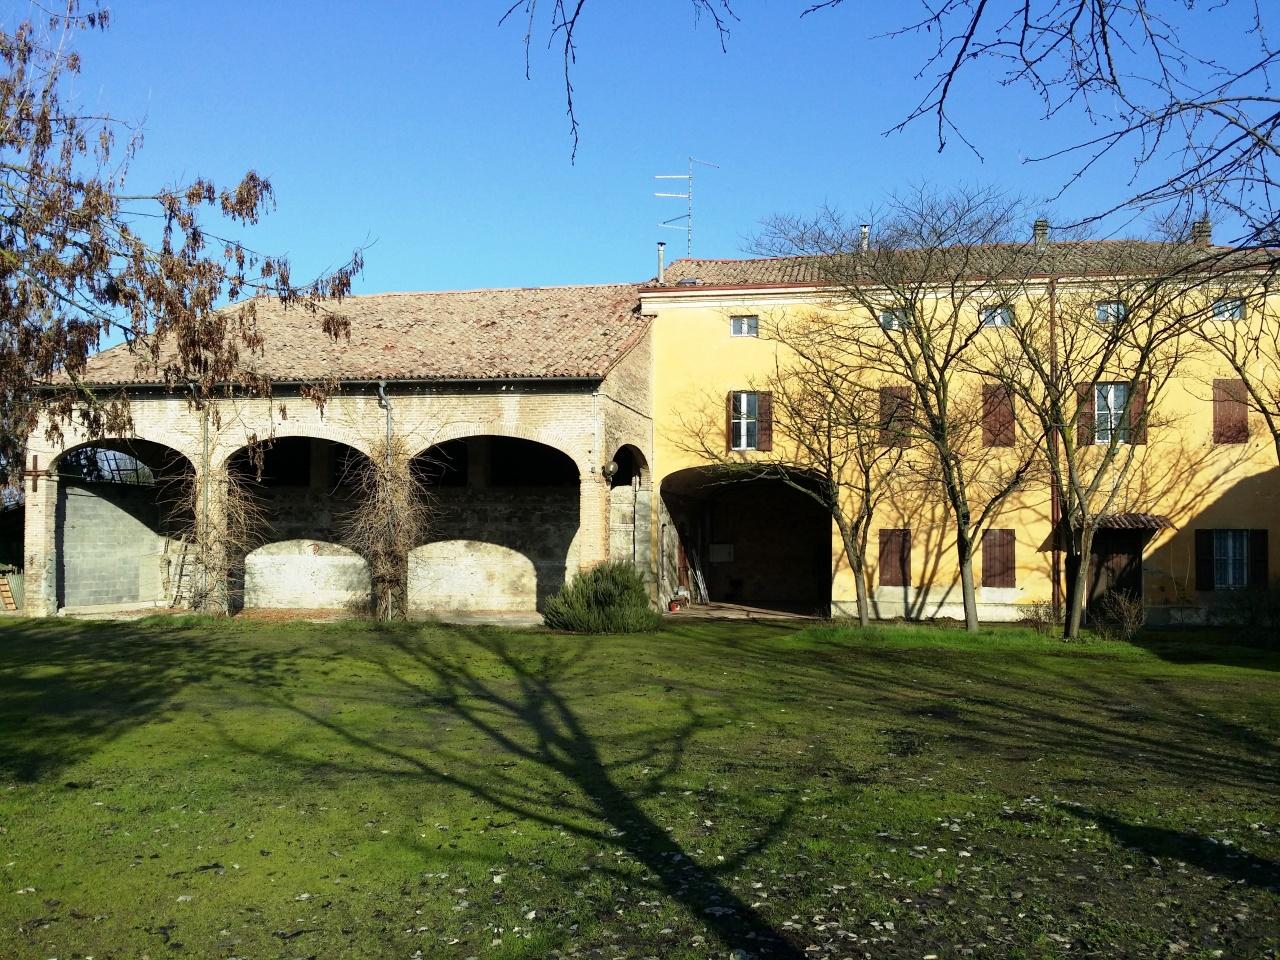 Matrimonio Rustico Parma : Rustico cascina in vendita a parma cerco